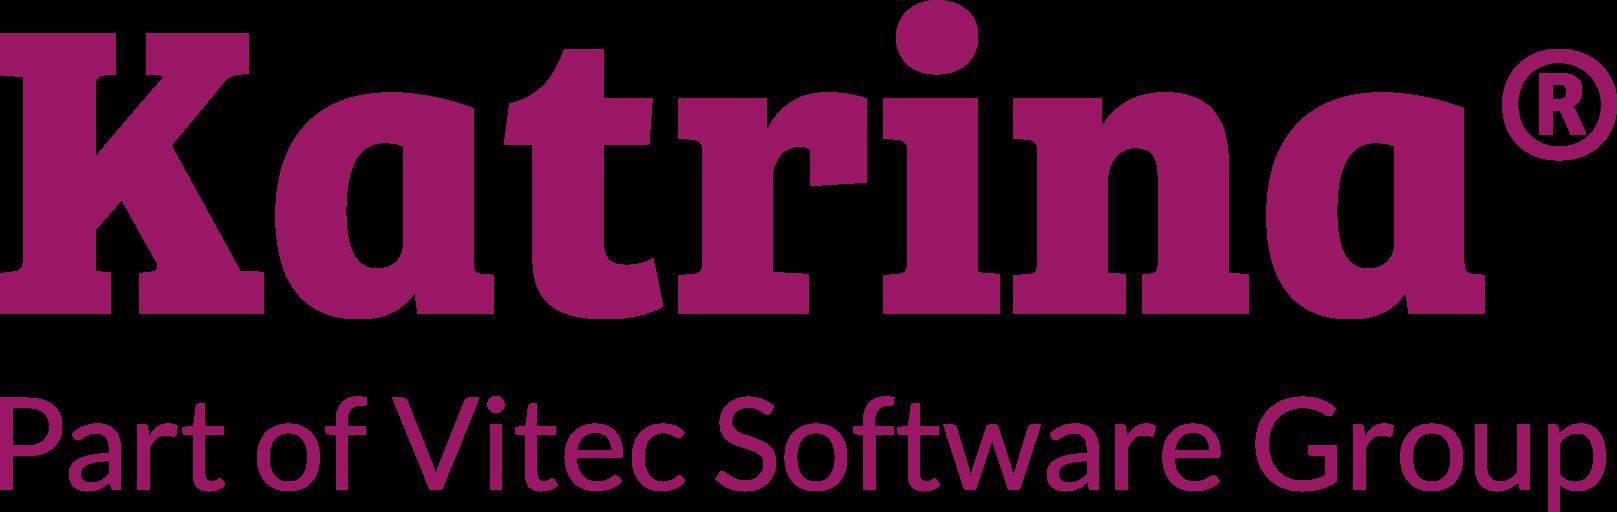 Vitec_katrina_logo_pos